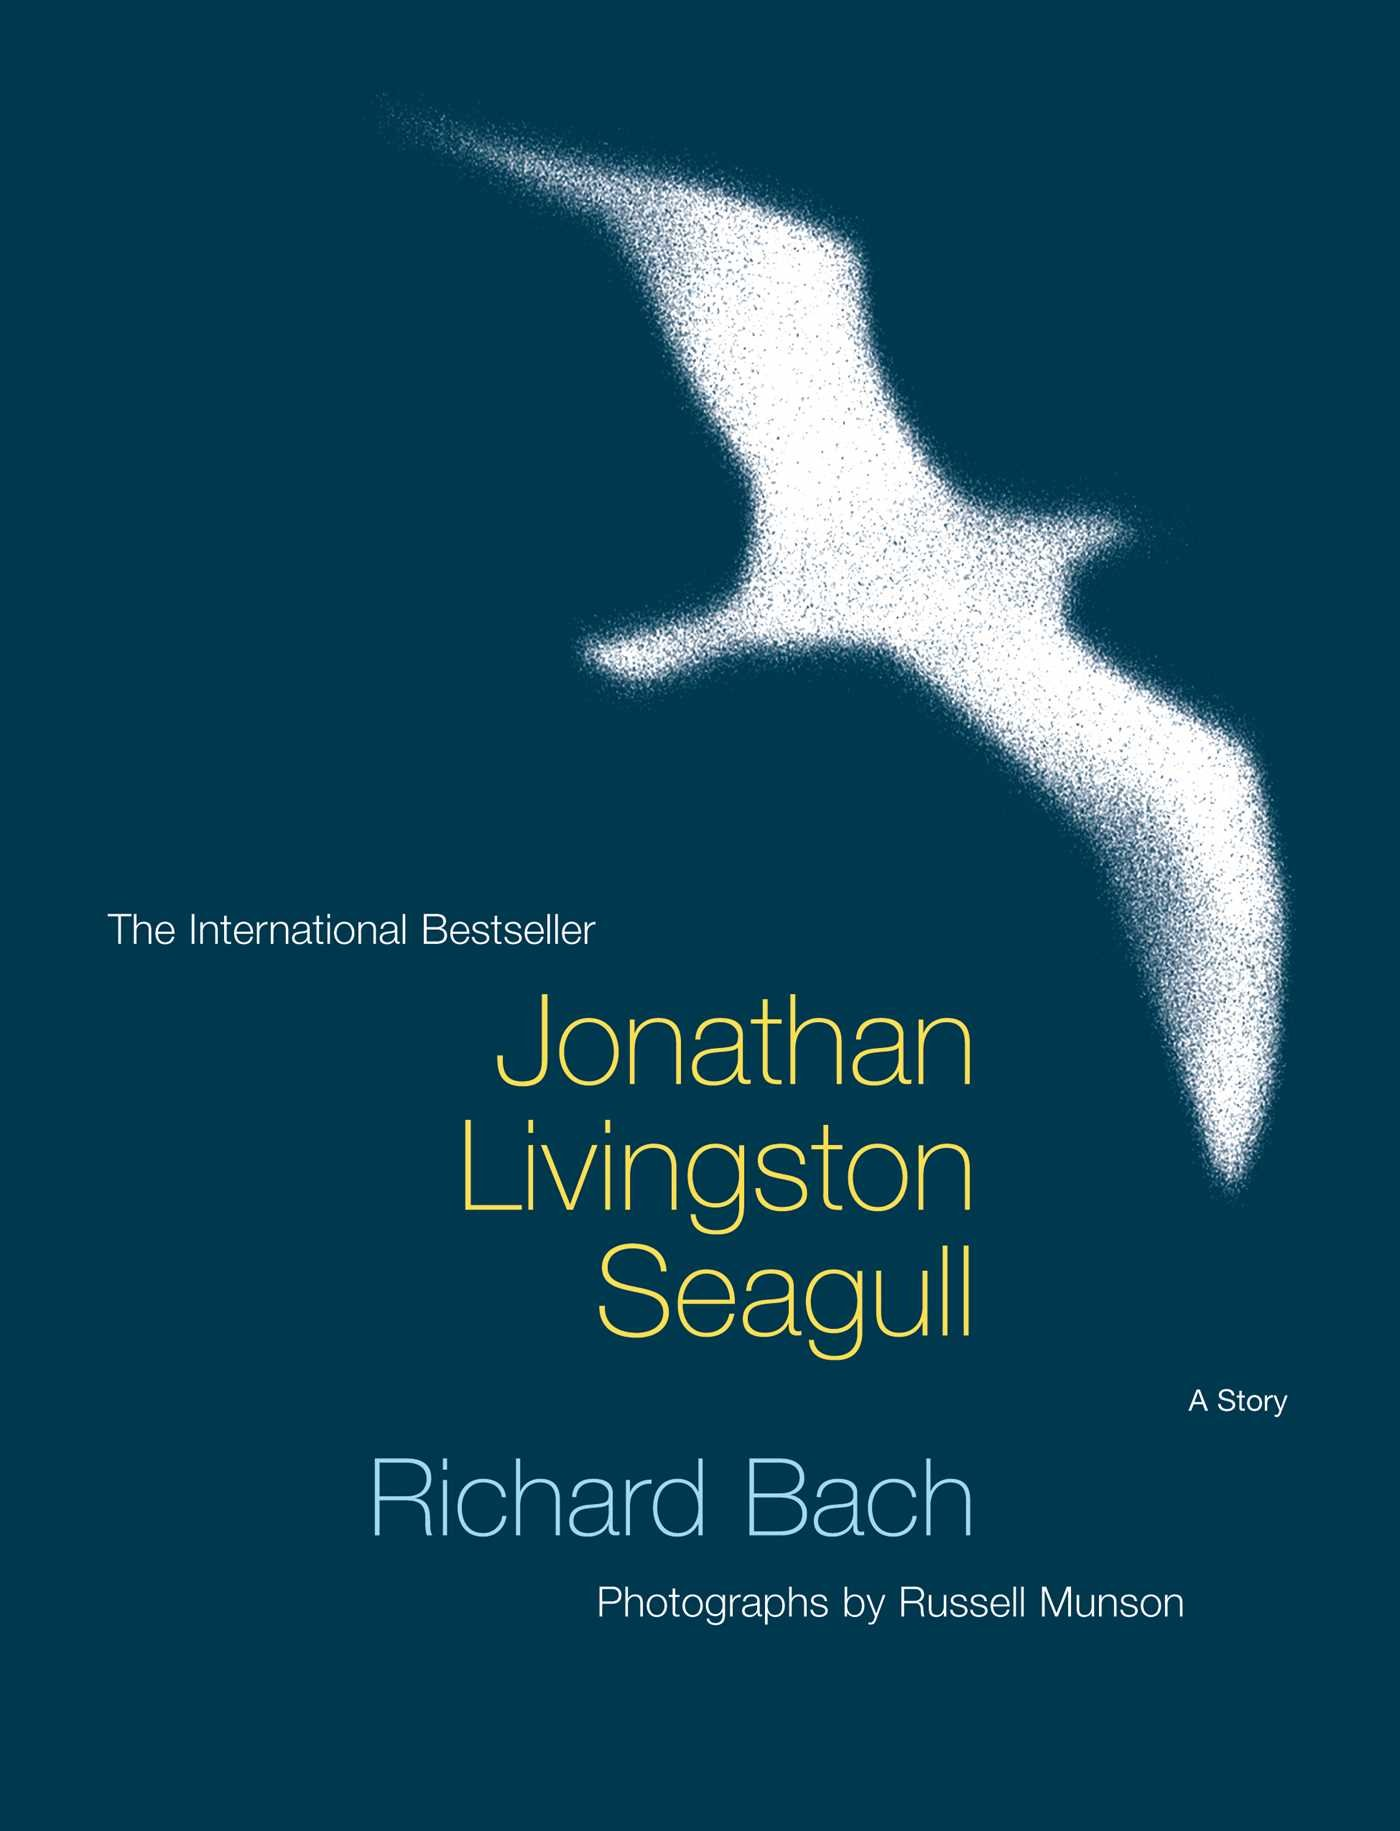 jonathan livingston seagull book cover